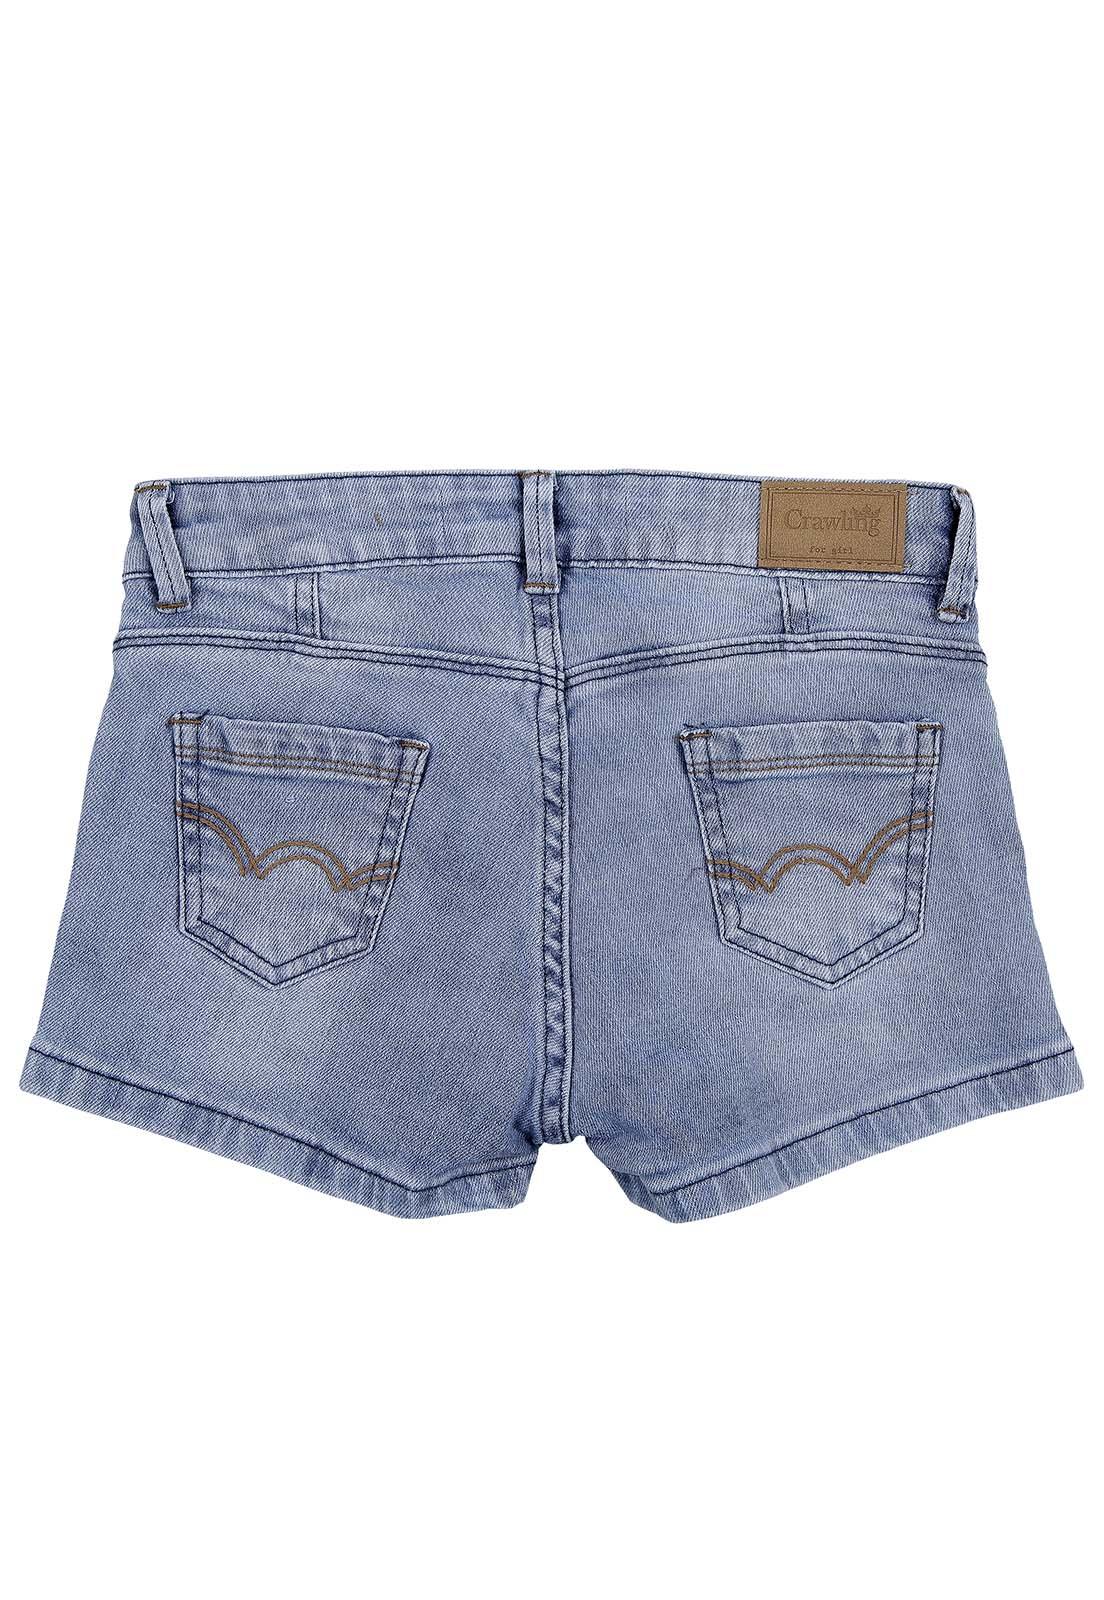 Shorts Feminino Crawling Jeans